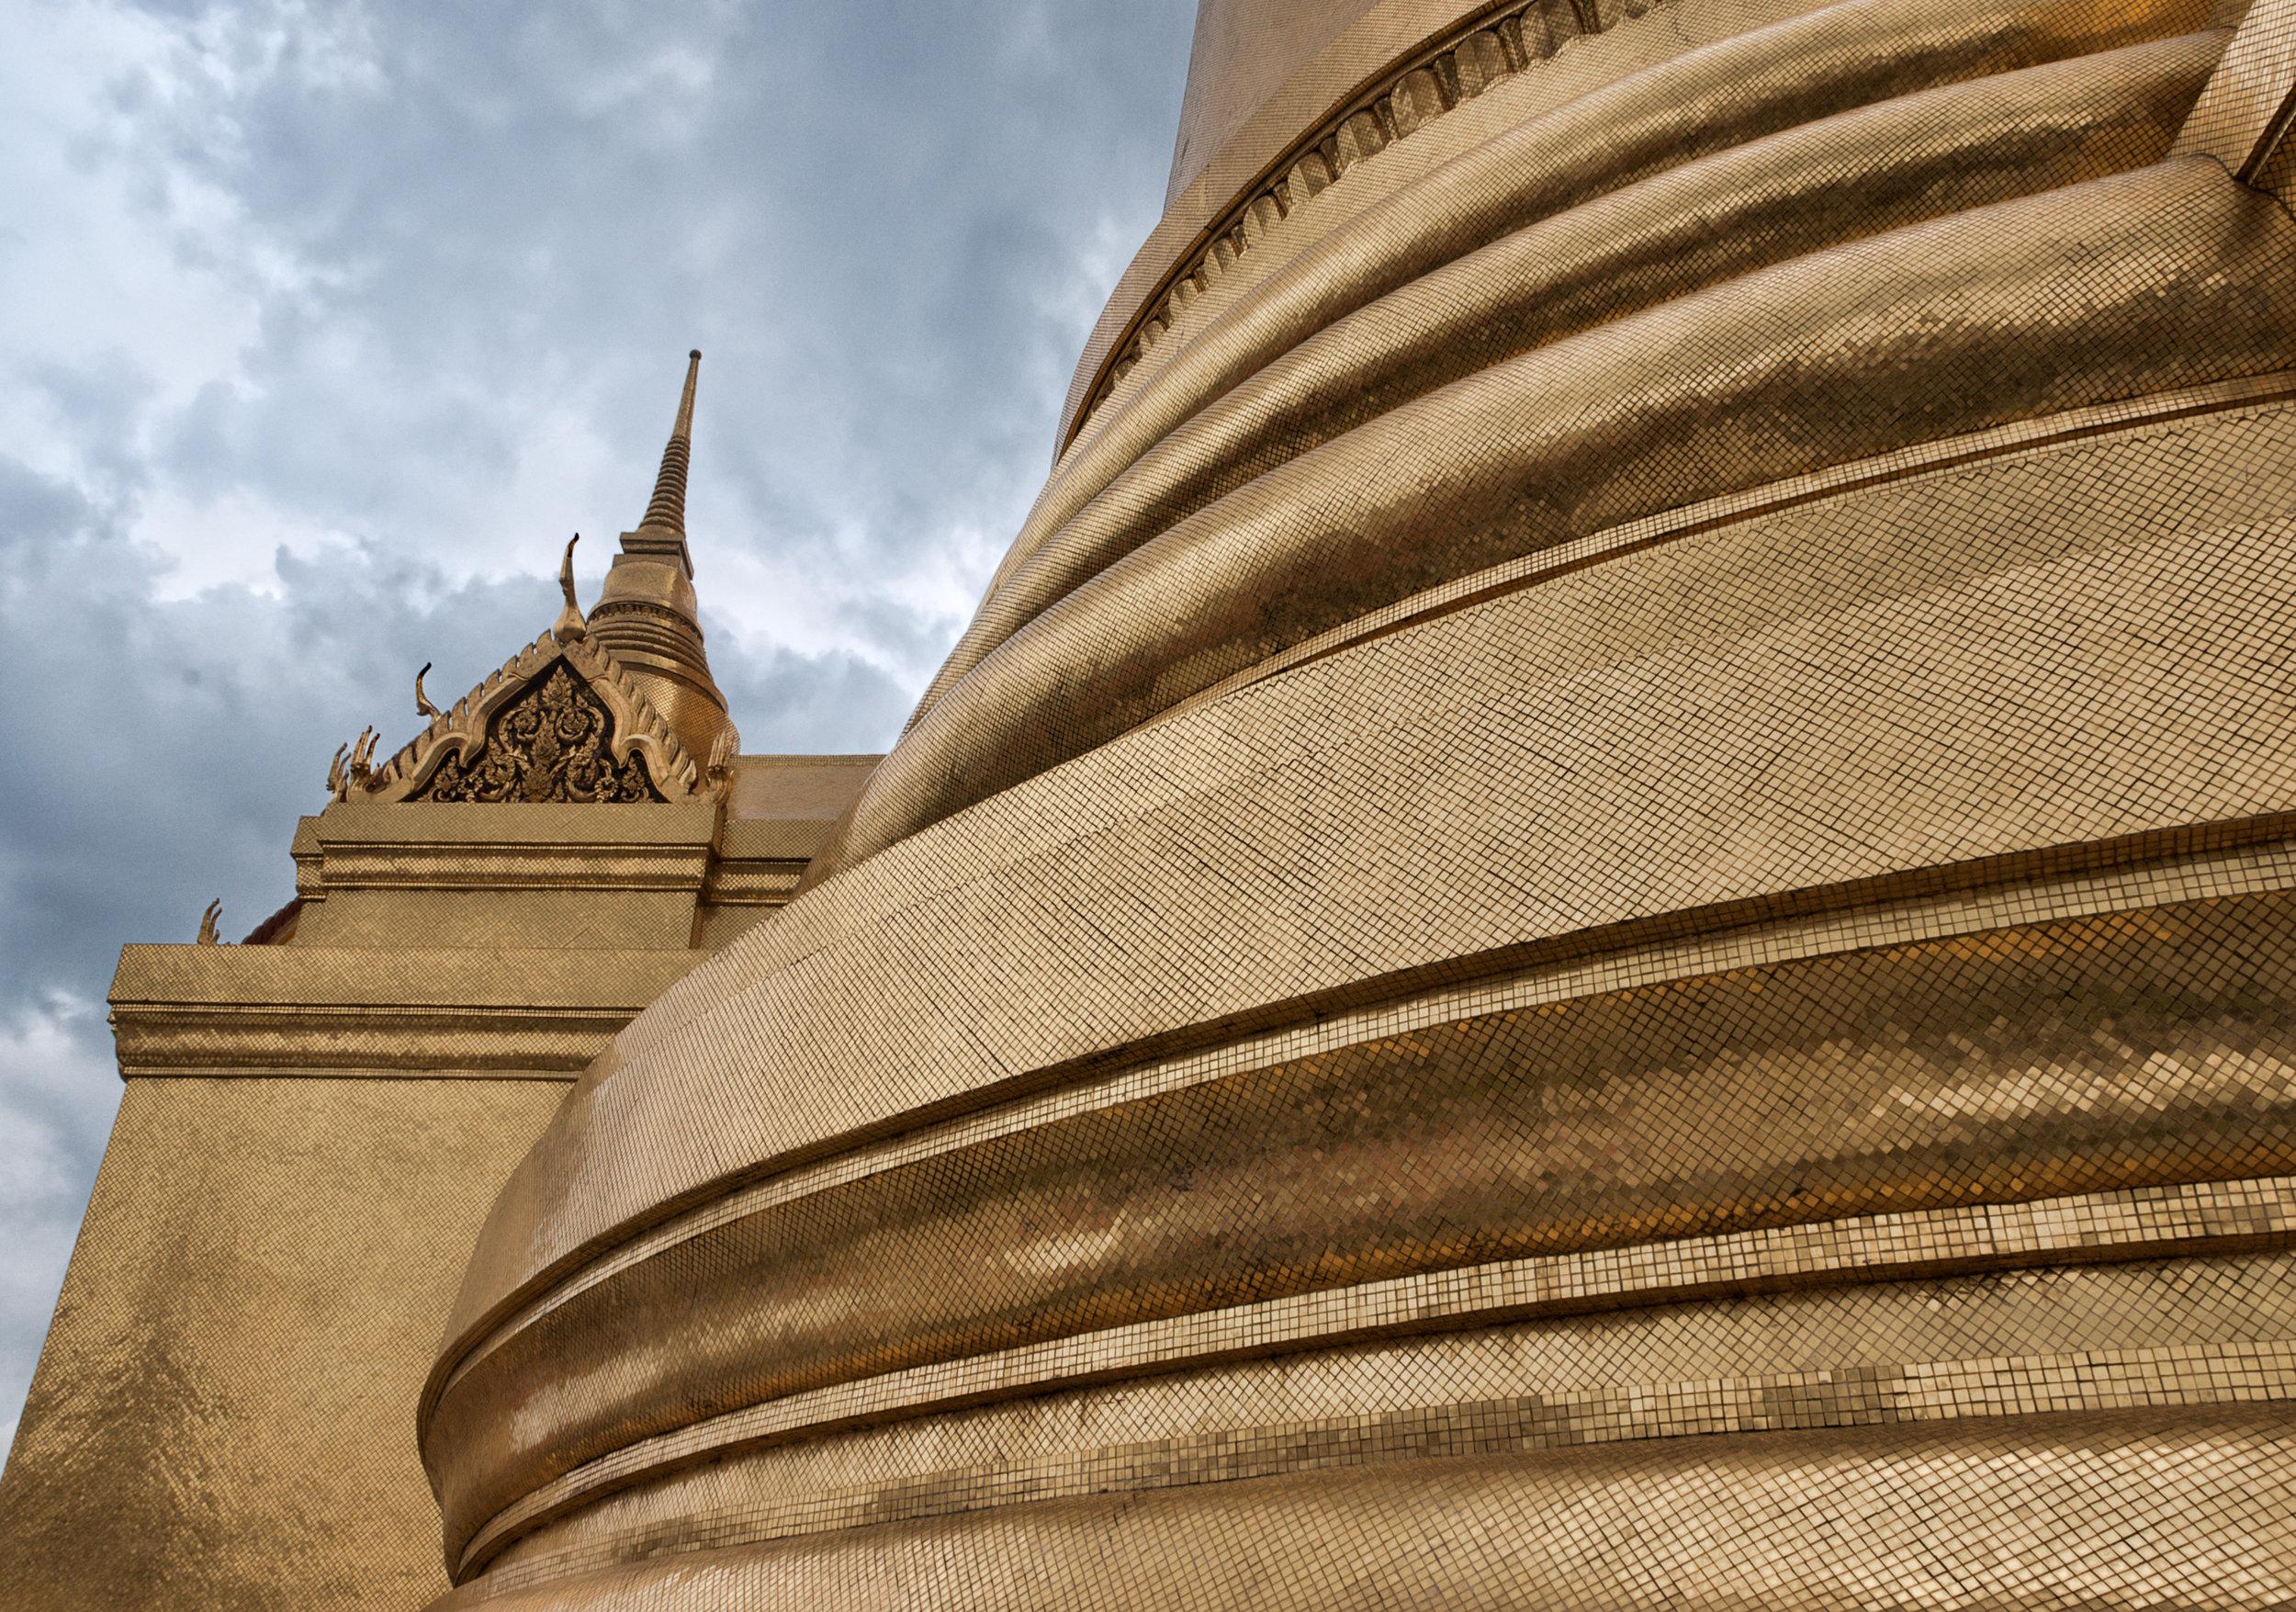 Thailand-John Bardell__DSC3598a.jpg